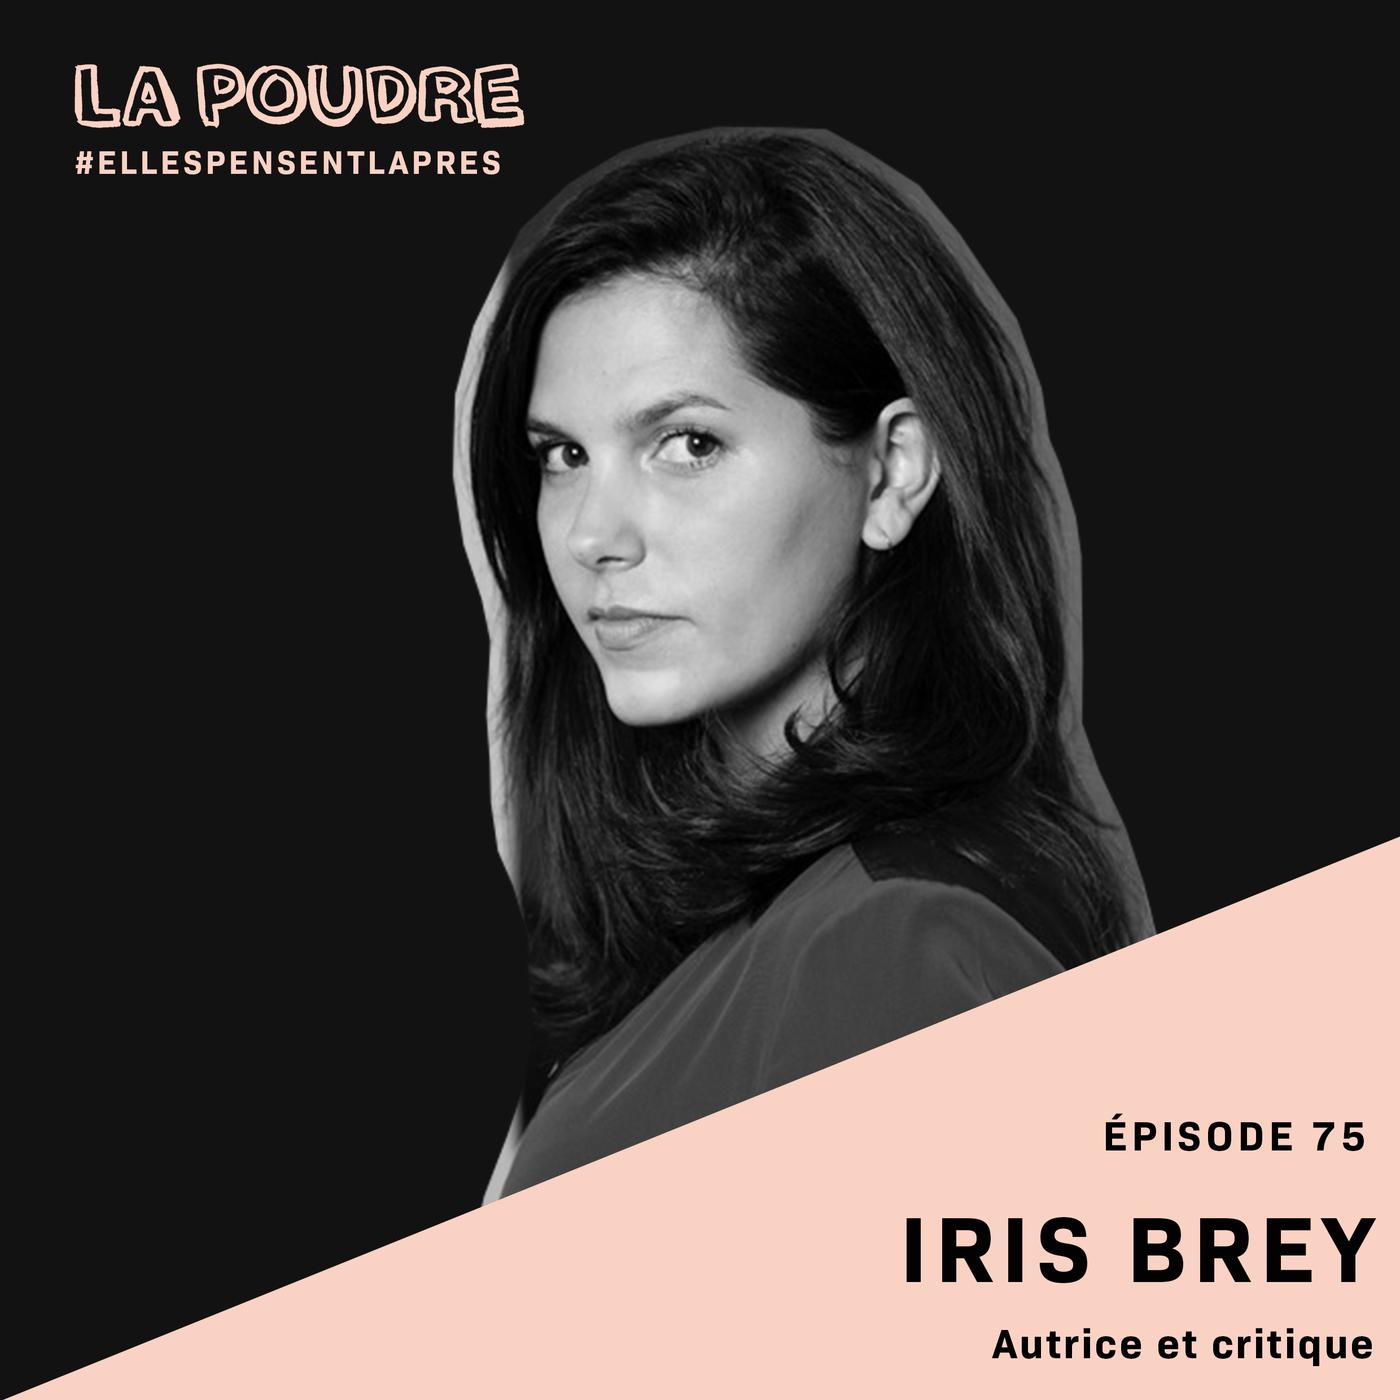 Épisode 75 - Iris Brey